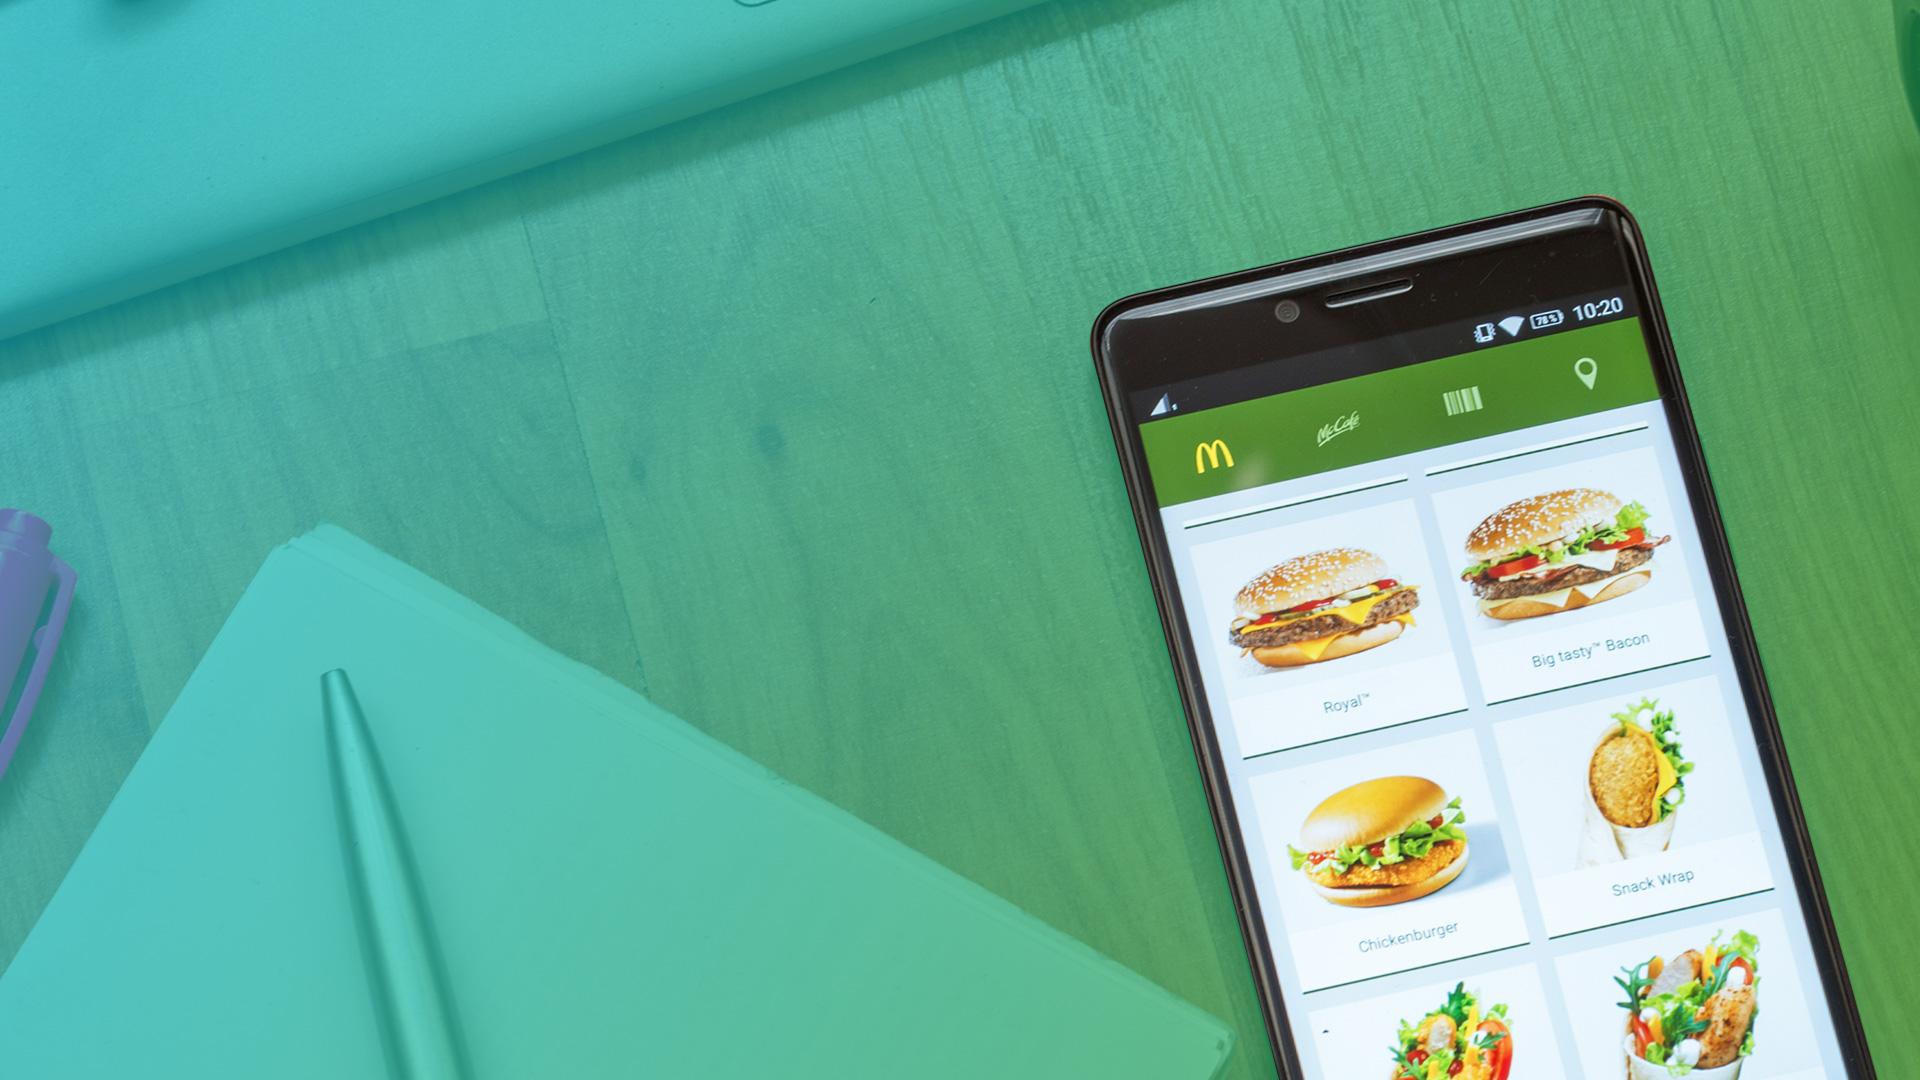 Image result for mobile ordering  mcdonalds